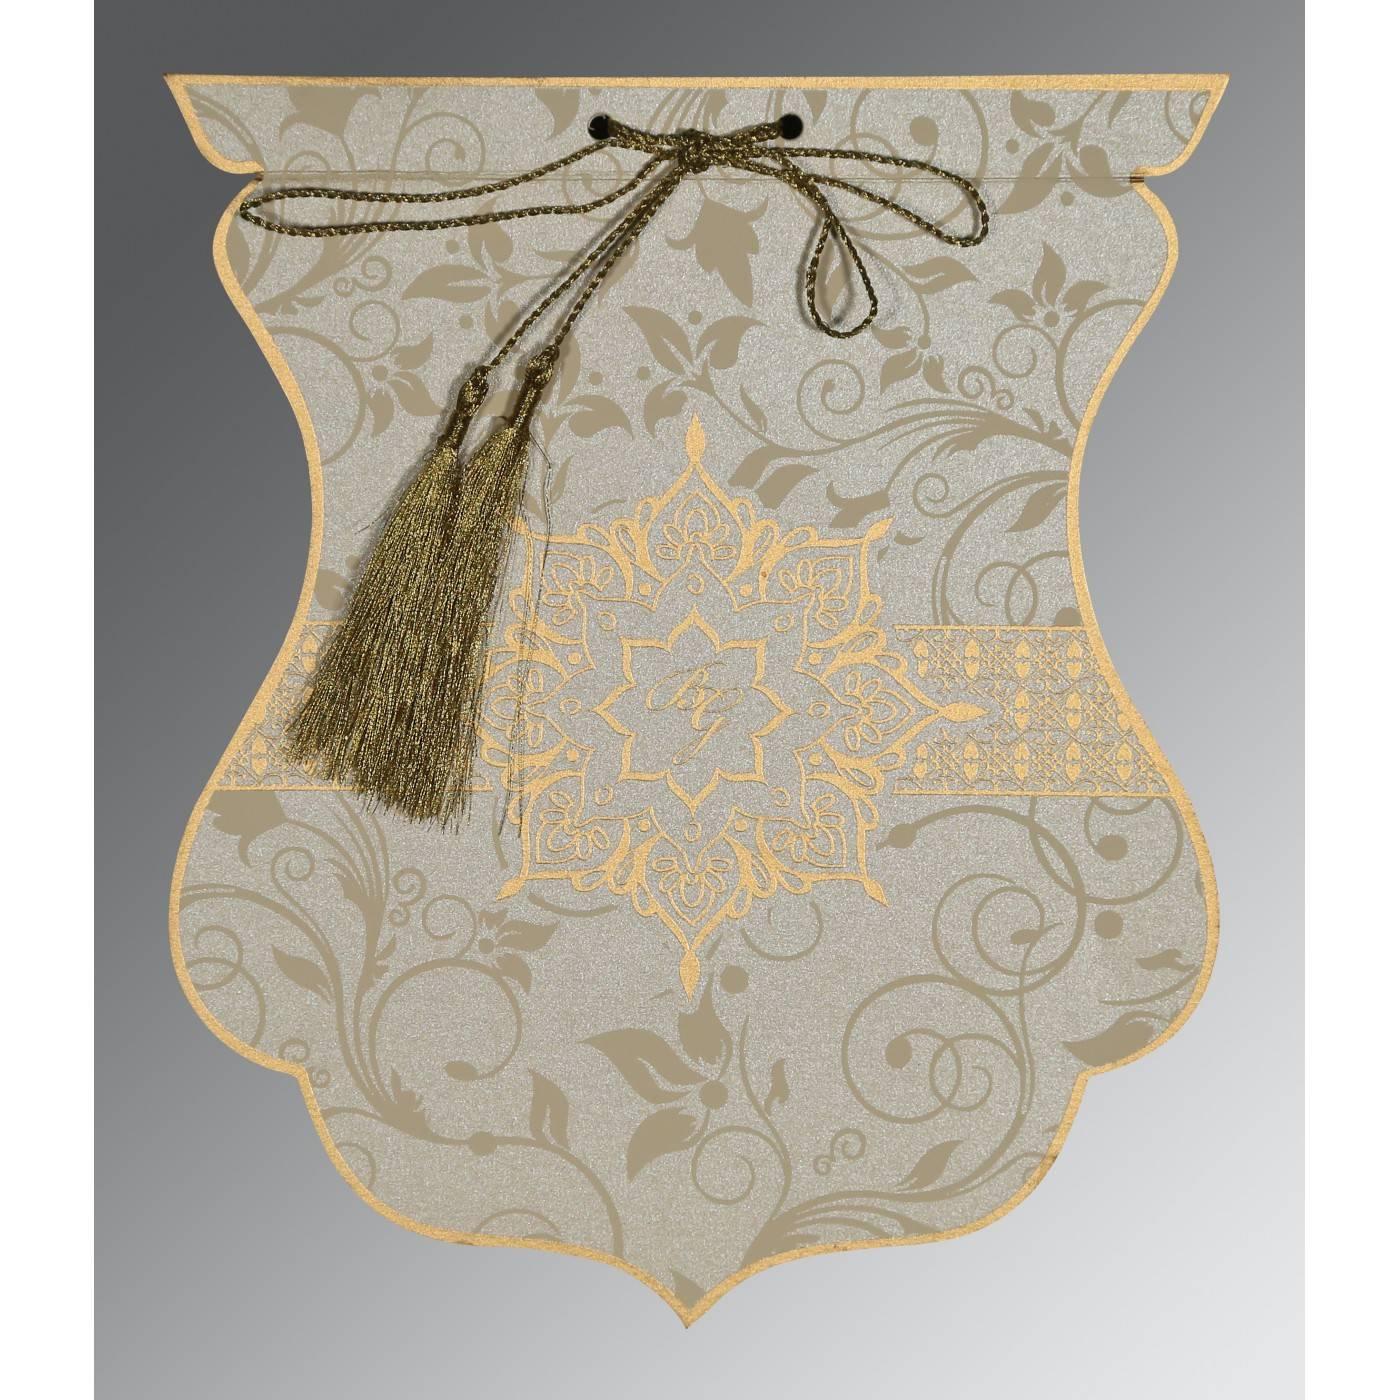 FOSSIL GREY SHIMMERY FLORAL THEMED - SCREEN PRINTED WEDDING CARD : CRU-8229E - IndianWeddingCards